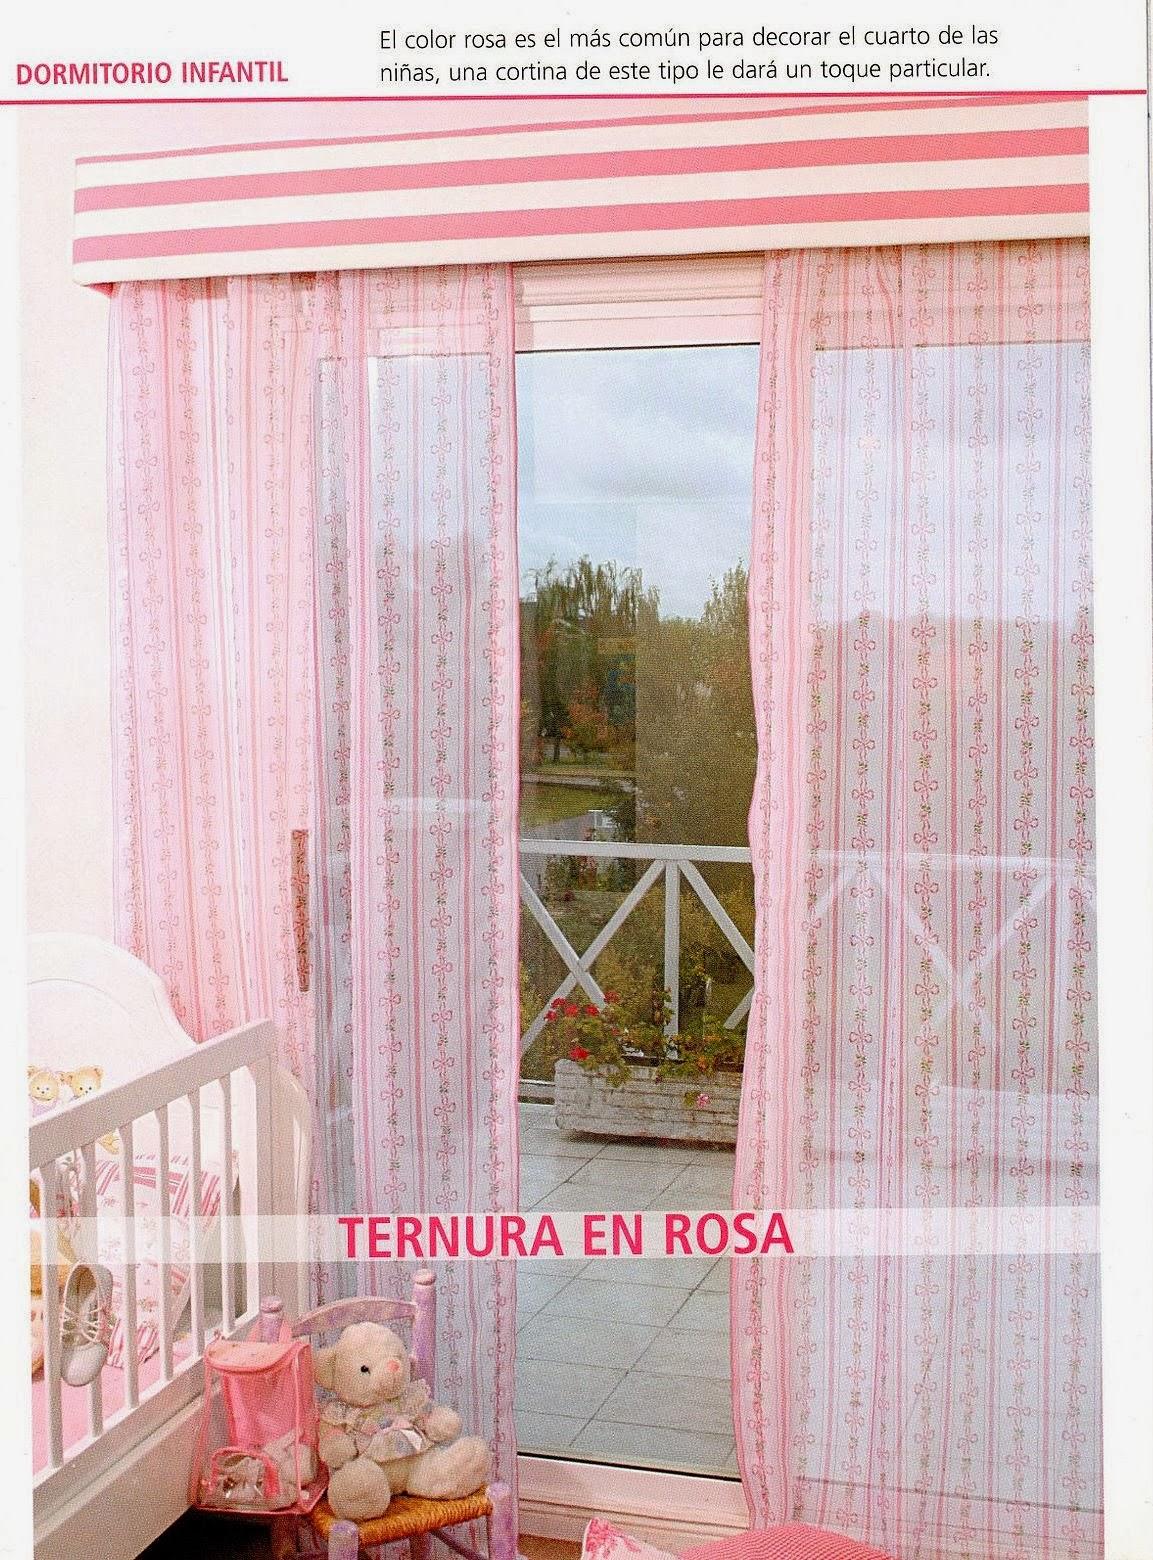 Revista cortinas revistas de manualidades gratis - Cortinas de goma ...